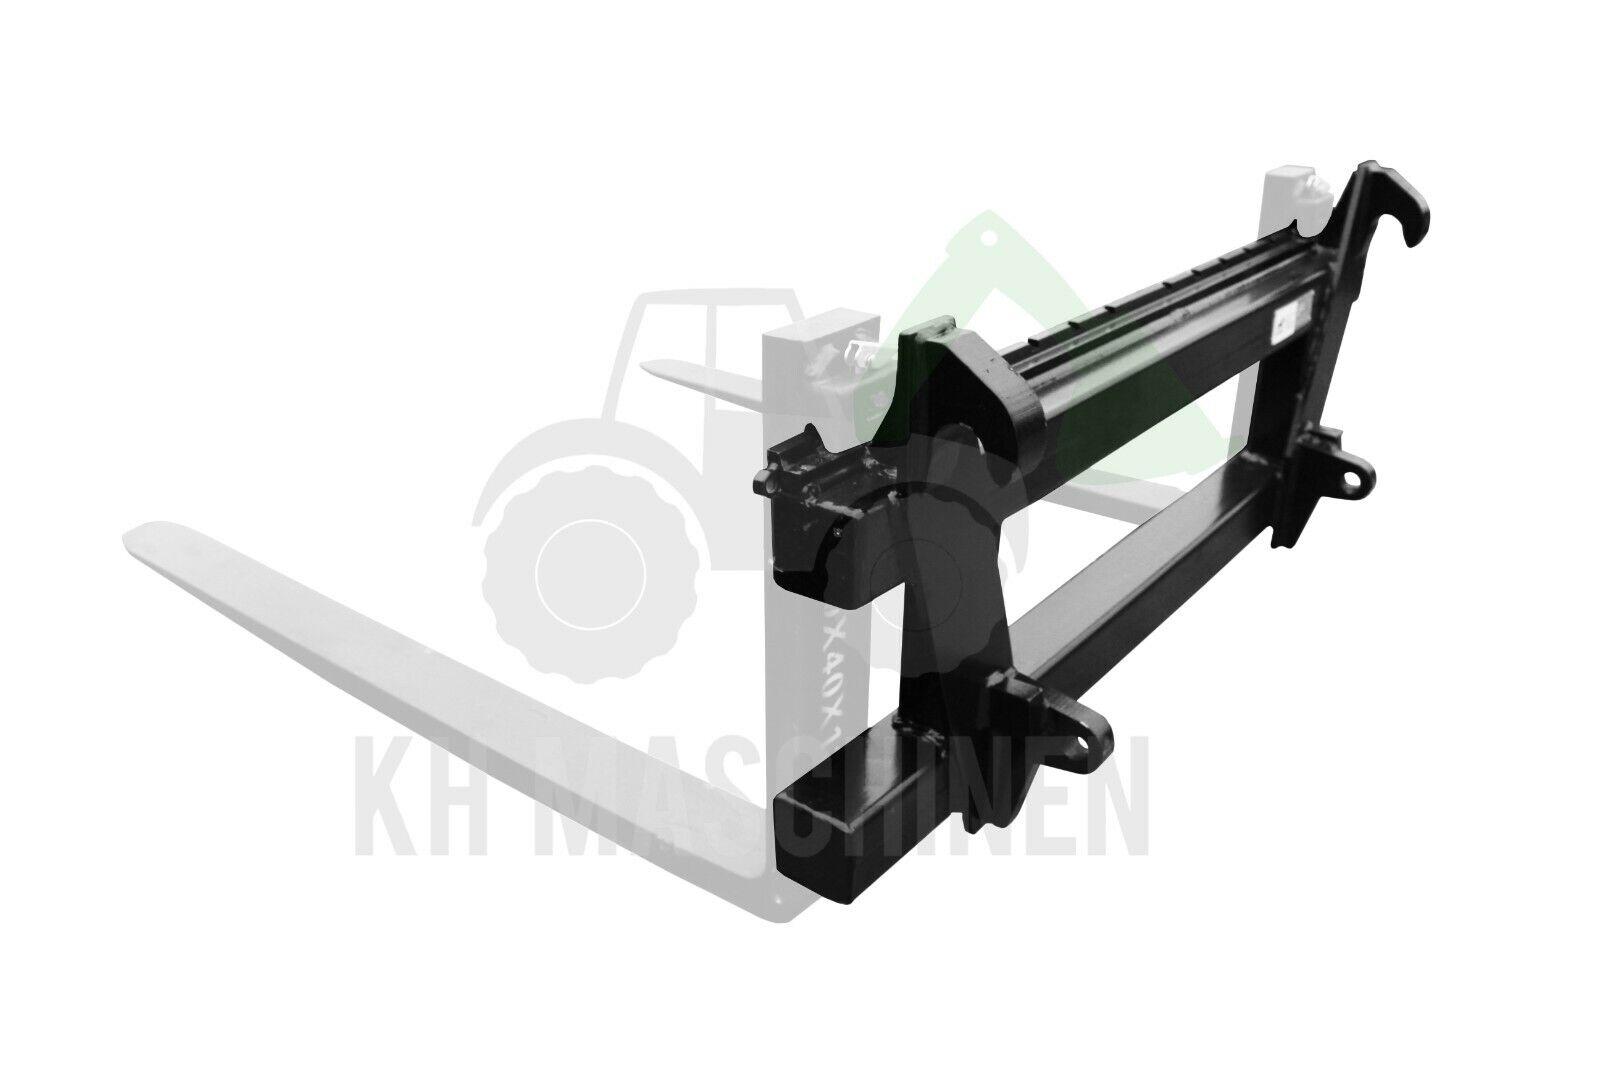 Gabelträger Palettengabel 1200x407mm Frontlader Euro-Norm ohne Gabeln Hydraulik